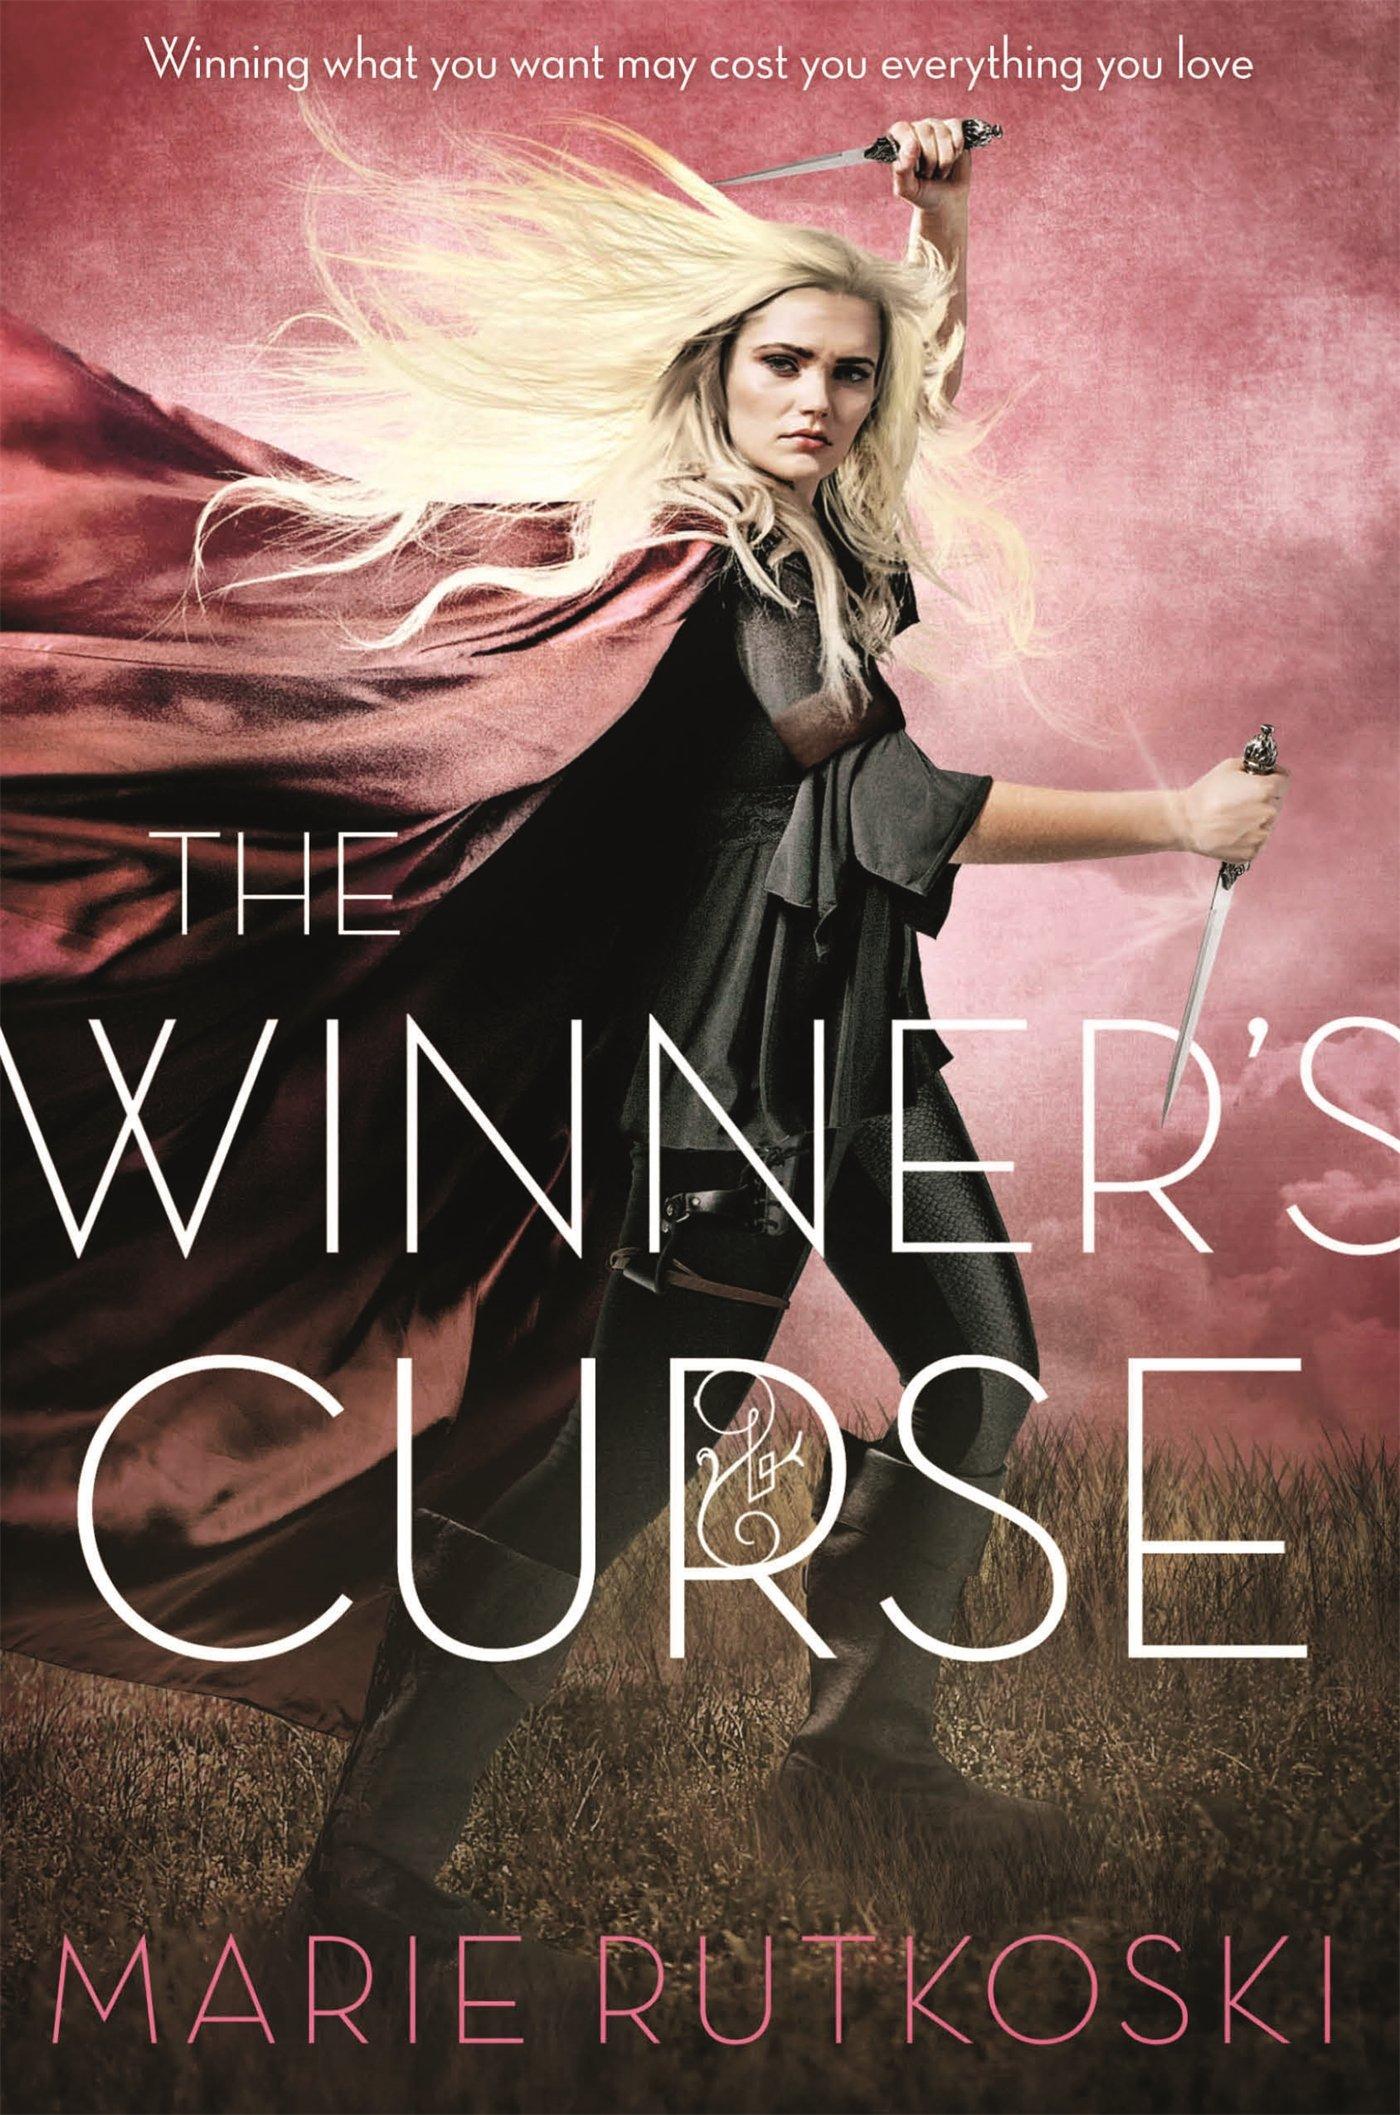 Amazon.com: The Winner's Curse (The Winner's Trilogy ...